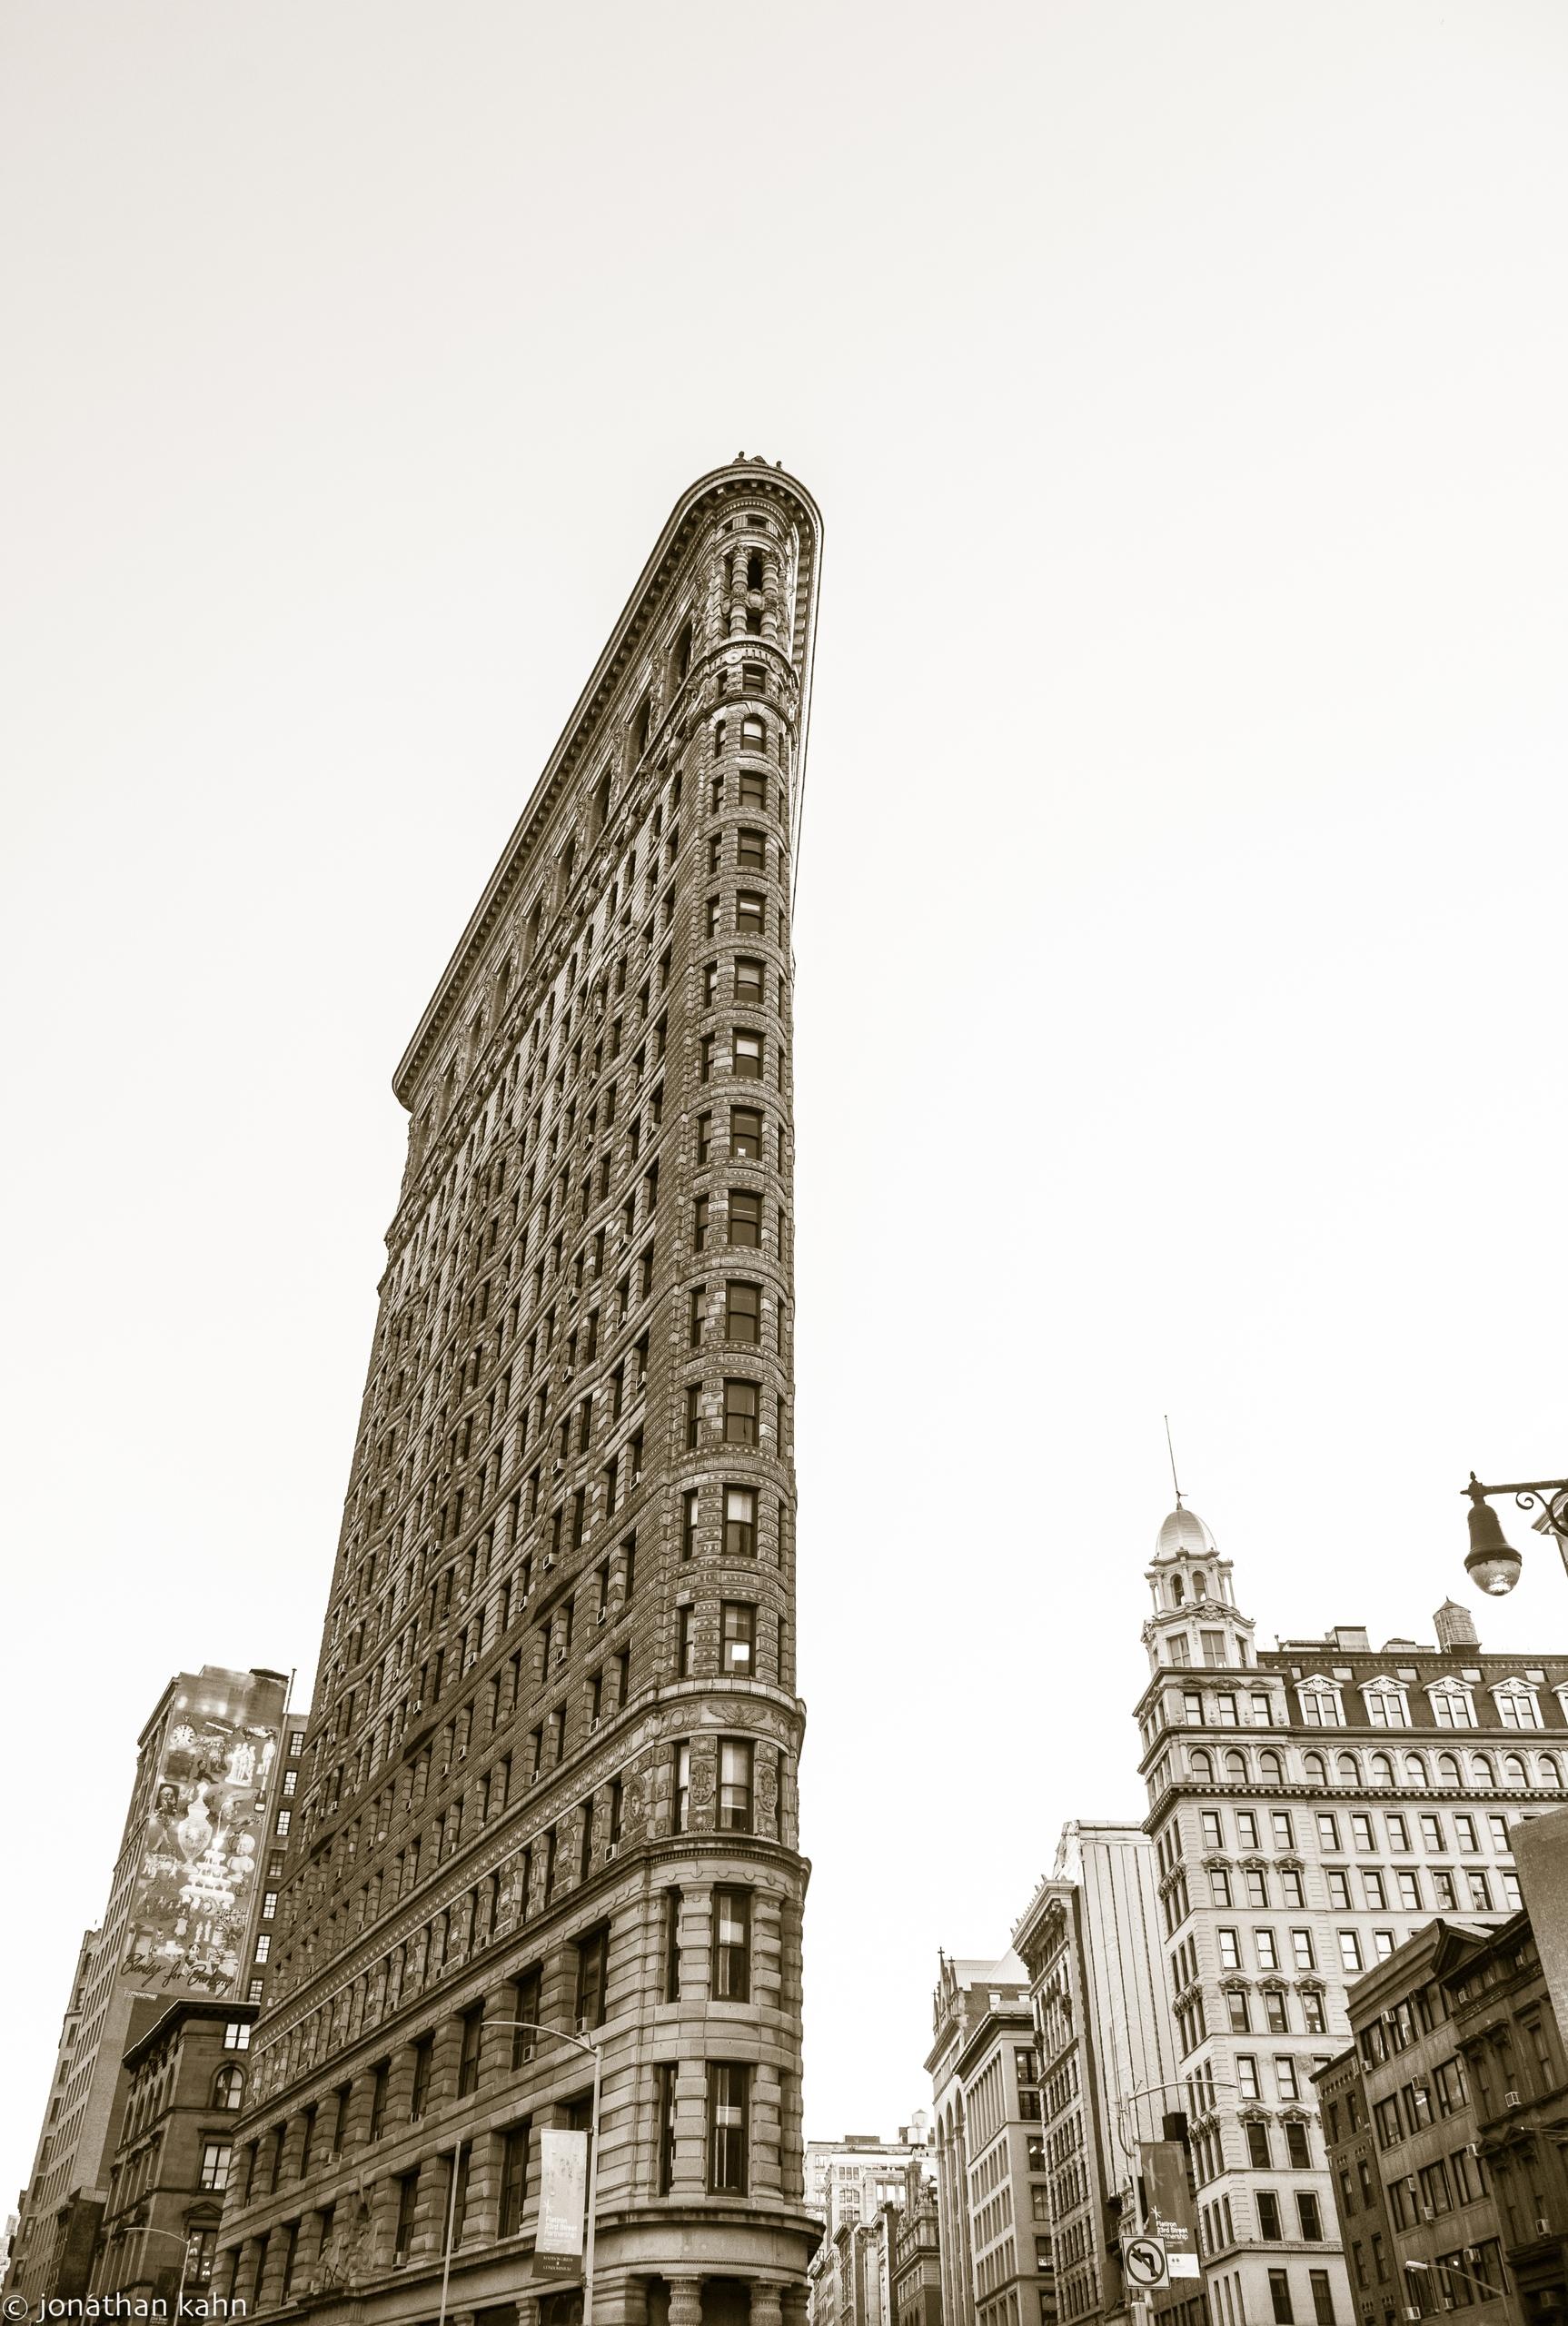 Flatiron Building York City - architecture - jonkahn | ello